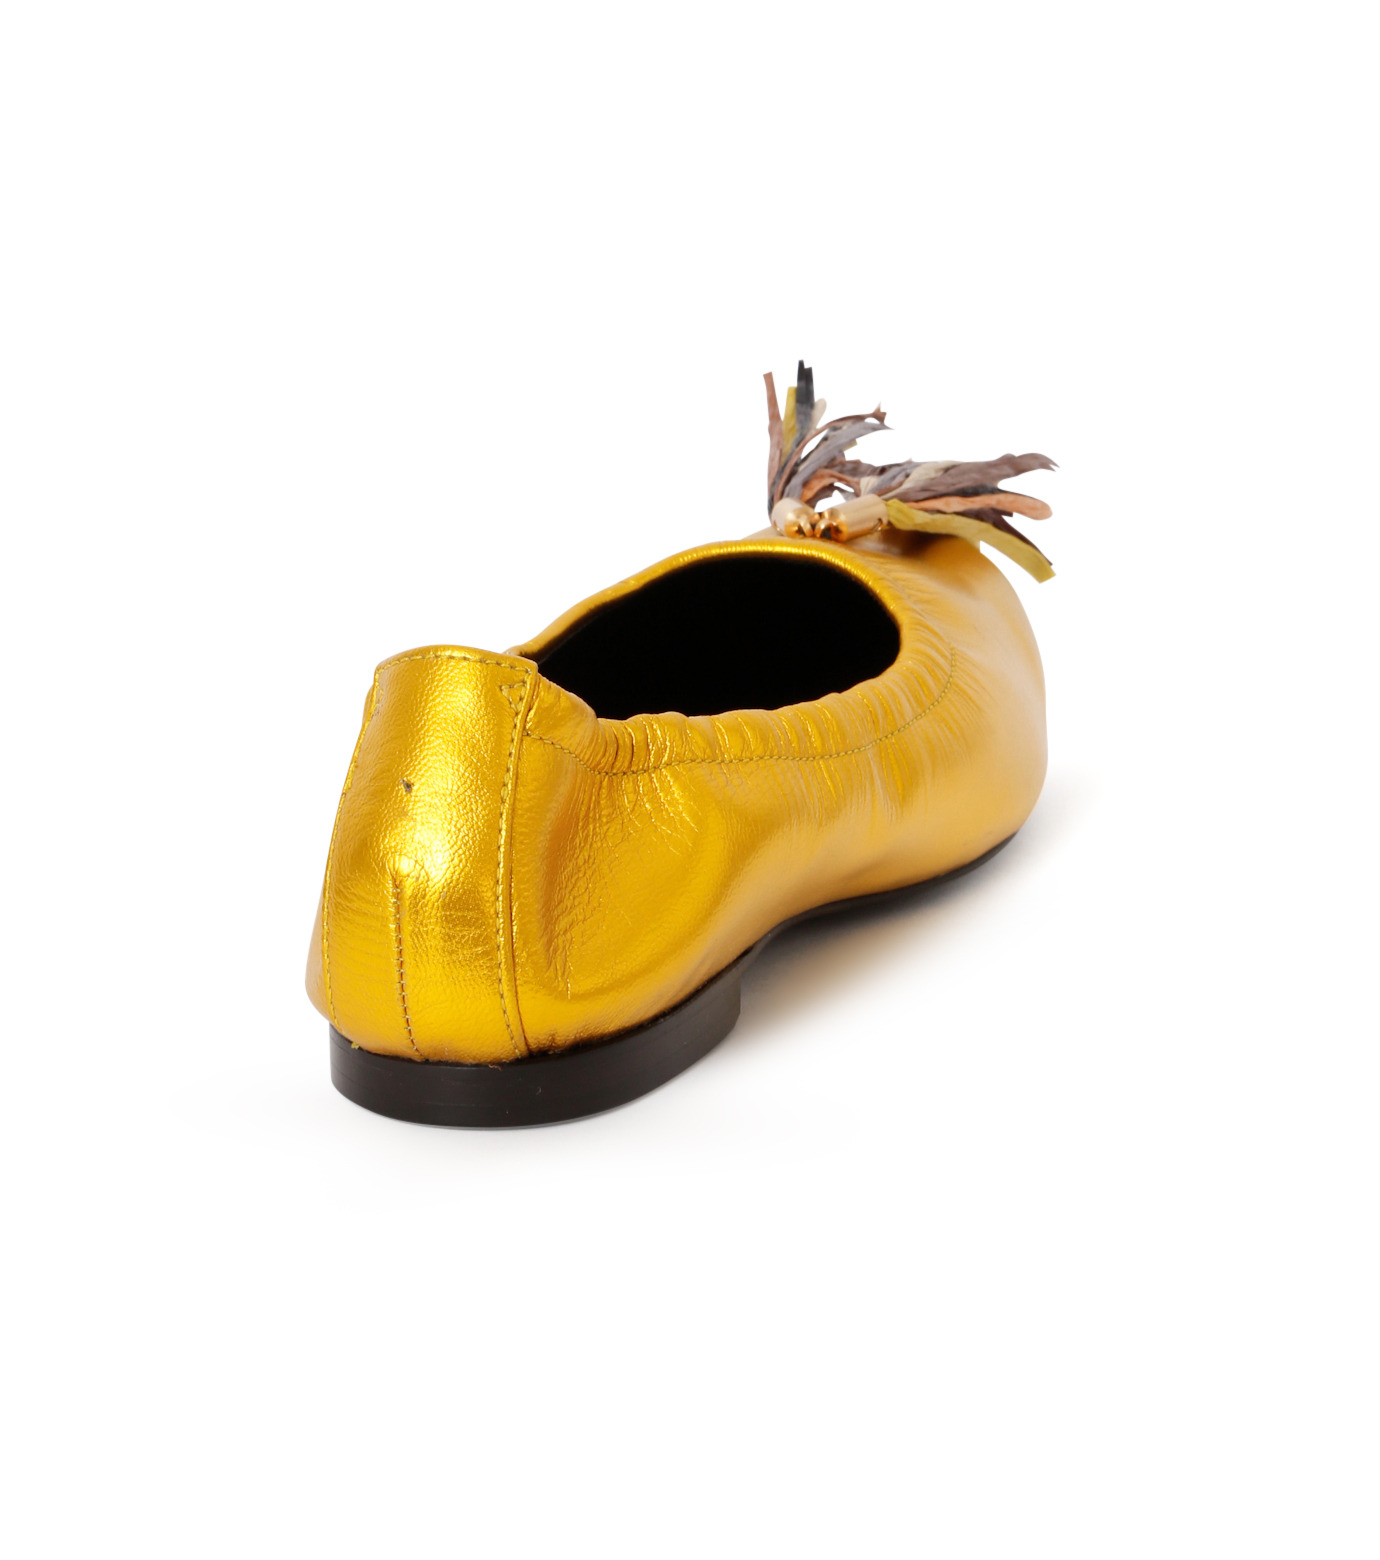 PIPPICHIC(ピッピシック)のballet shoes-GOLD(シューズ/shoes)-PP16BALLET19-2 拡大詳細画像3